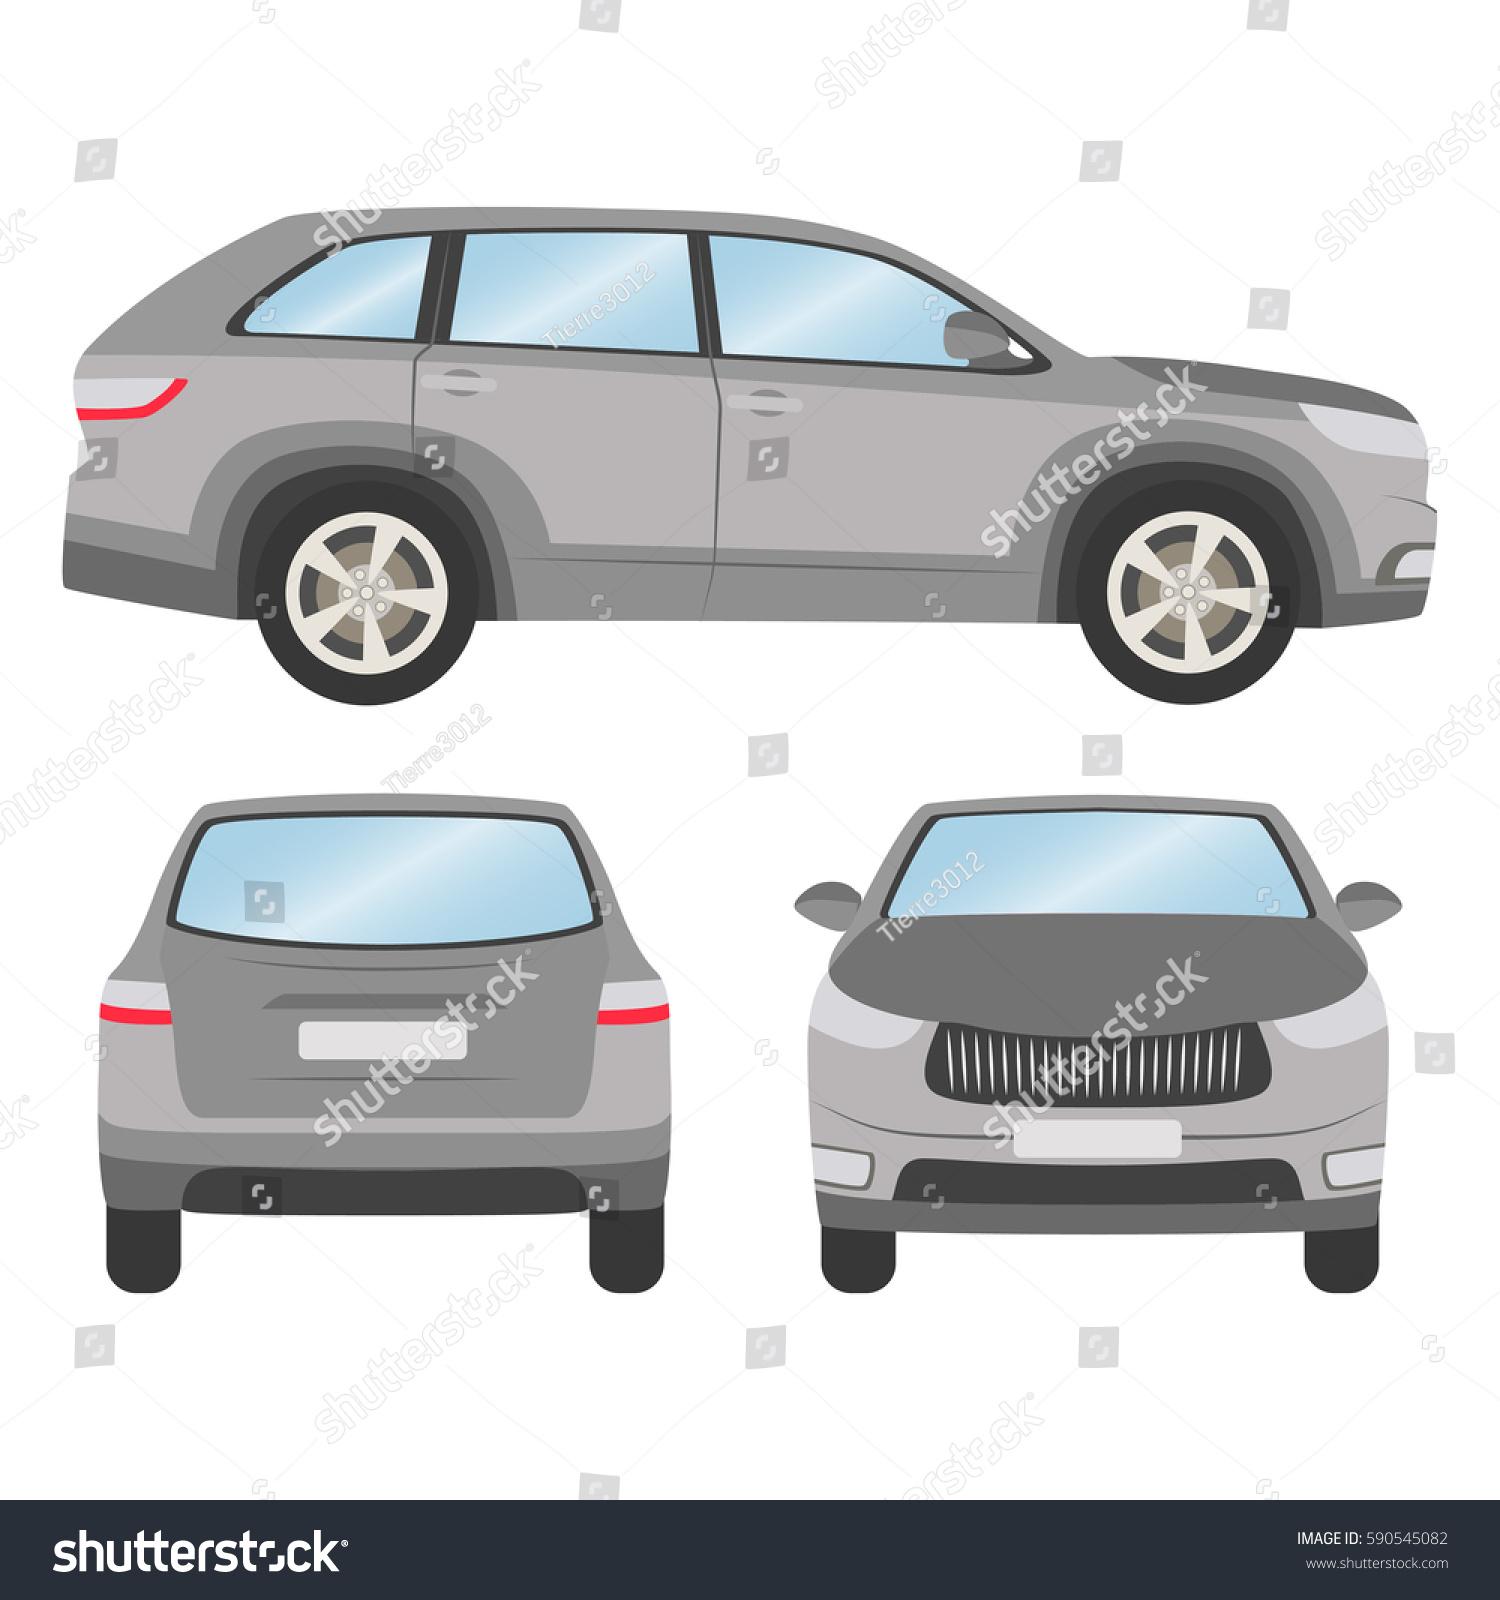 car vector template on white background stock vector 590545082 shutterstock. Black Bedroom Furniture Sets. Home Design Ideas